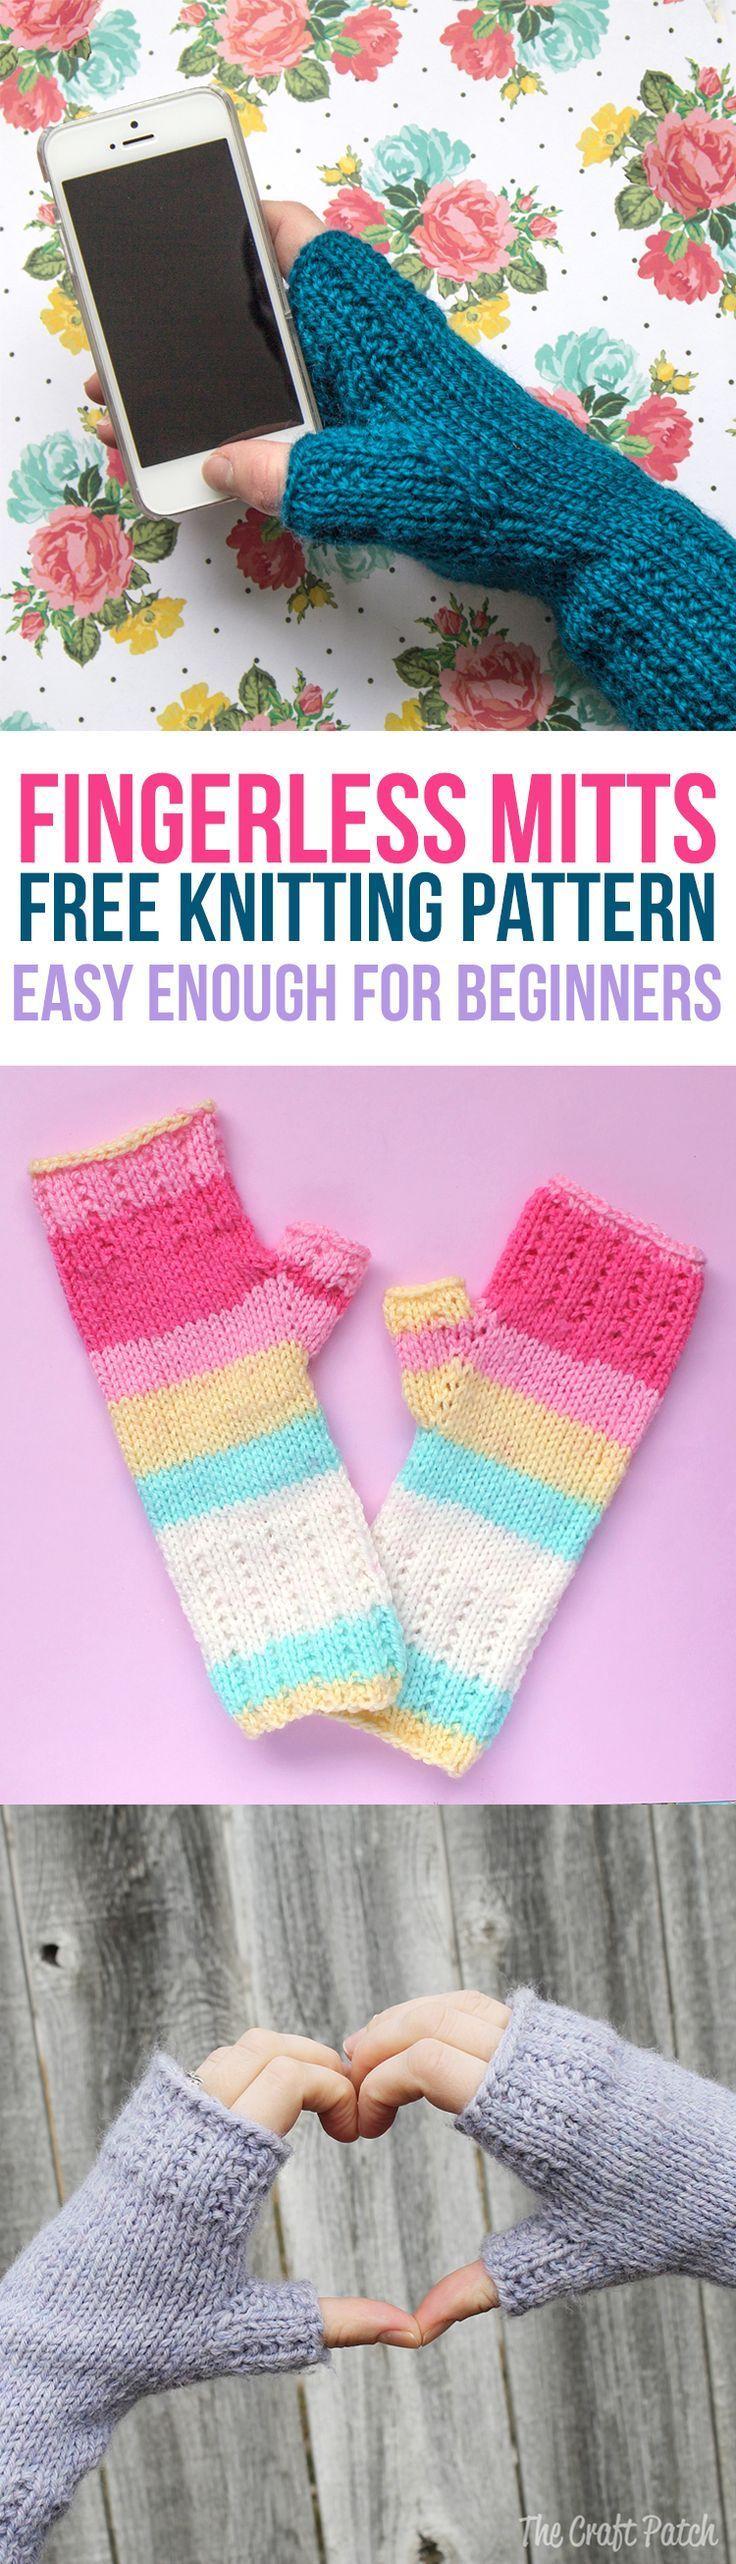 257 best Knitting images on Pinterest | Knit patterns, Knitting ...